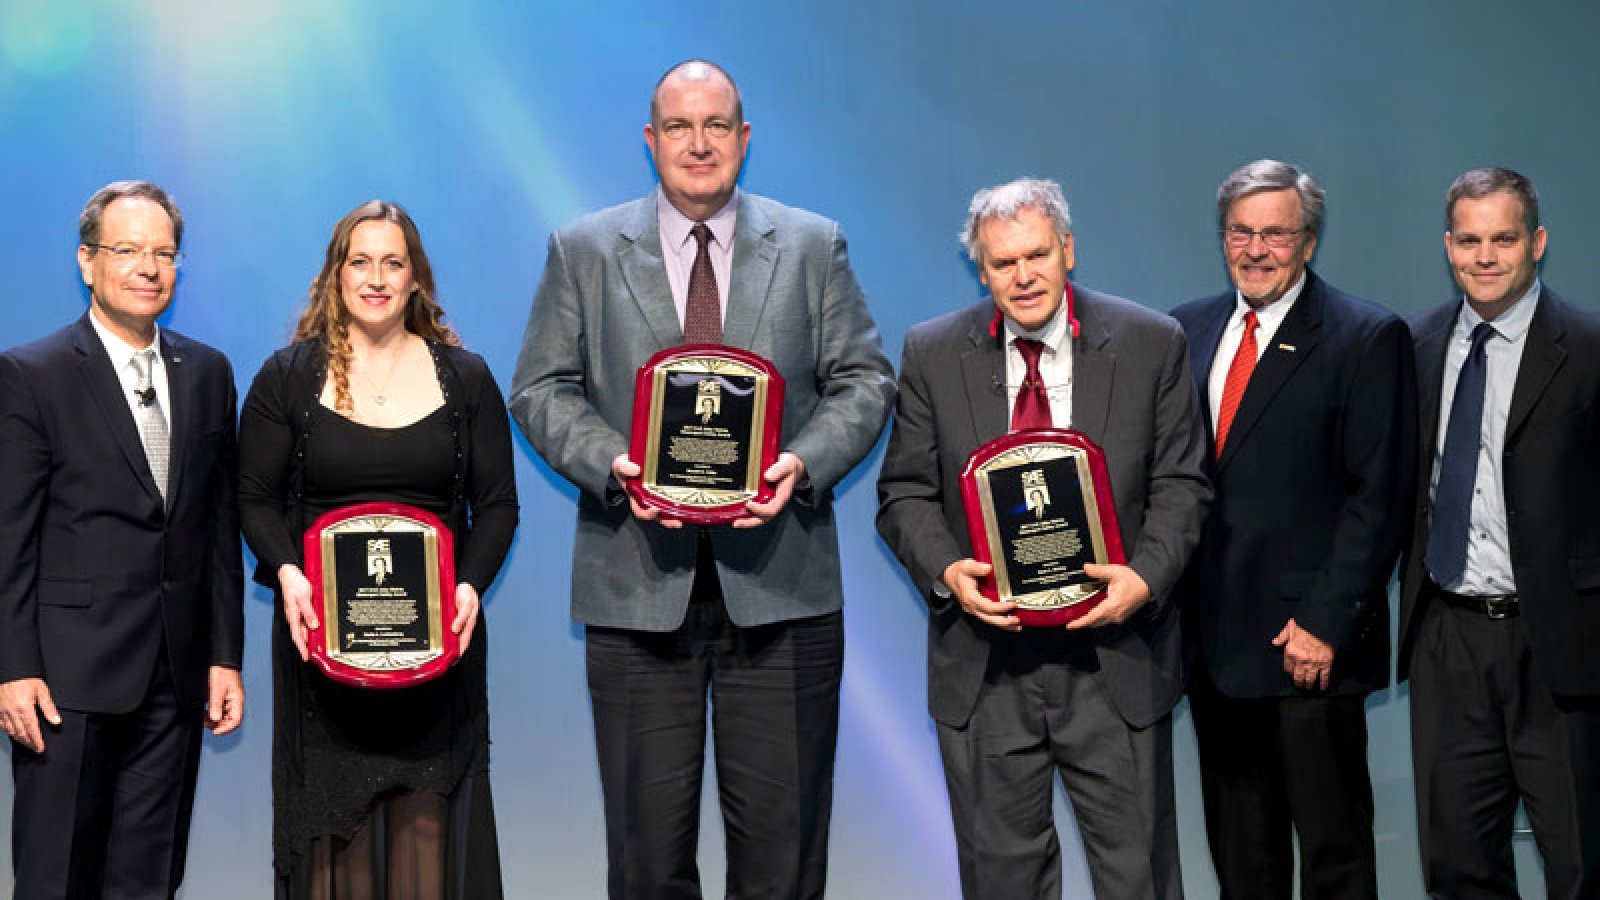 Members of SAE International present the John Melvin Motorsports Safety Award to Karla Lechtenberg, Ron Faller and Dean Sicking